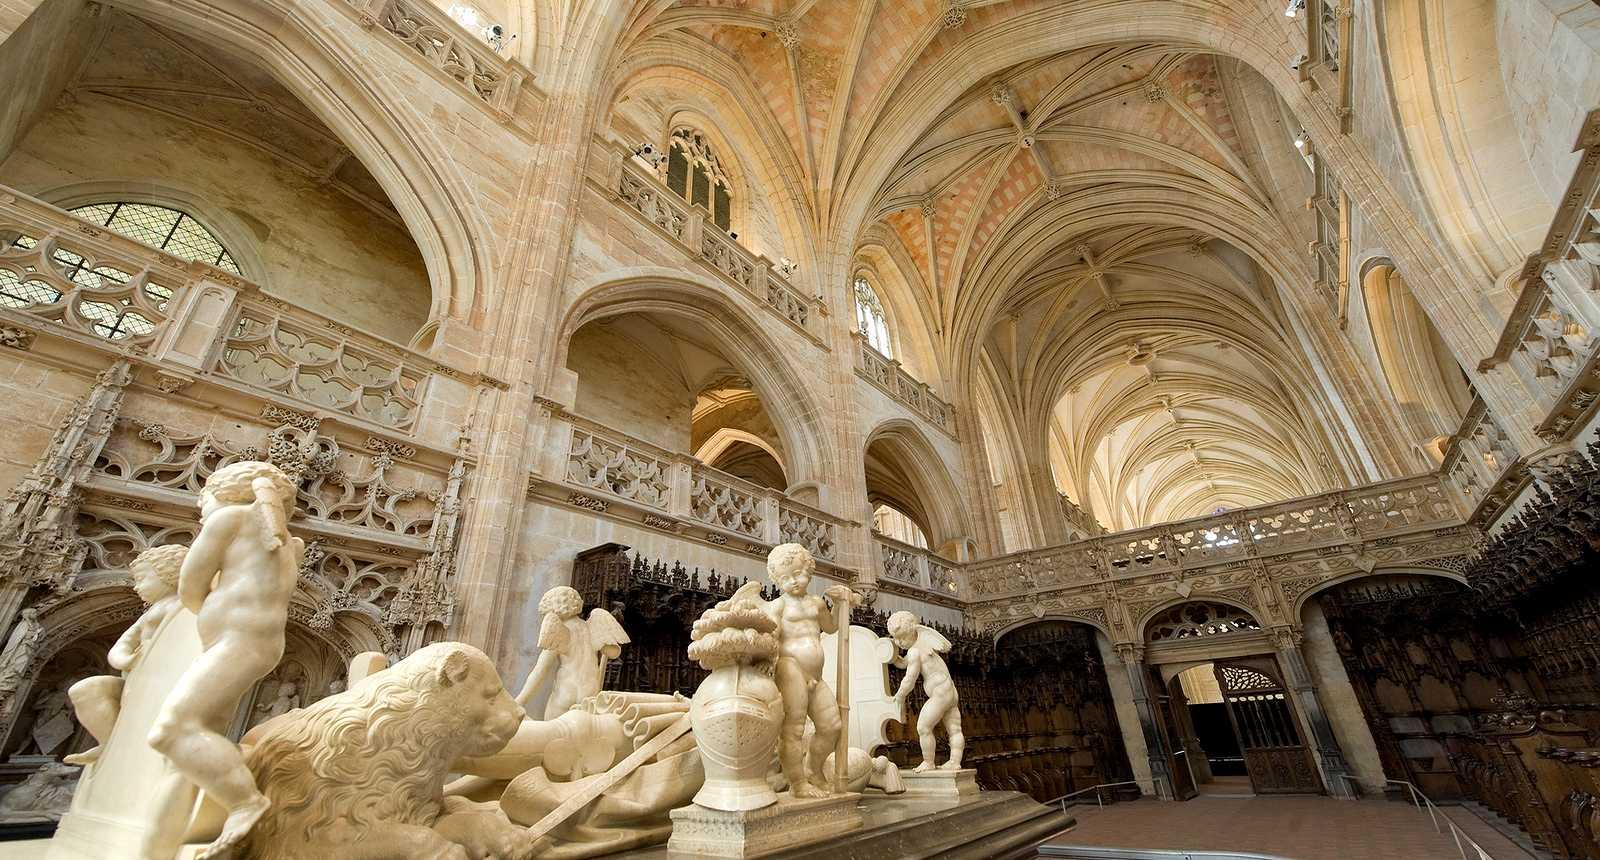 Tombeau de Philibert de Savoie au Monastère royal de Brou